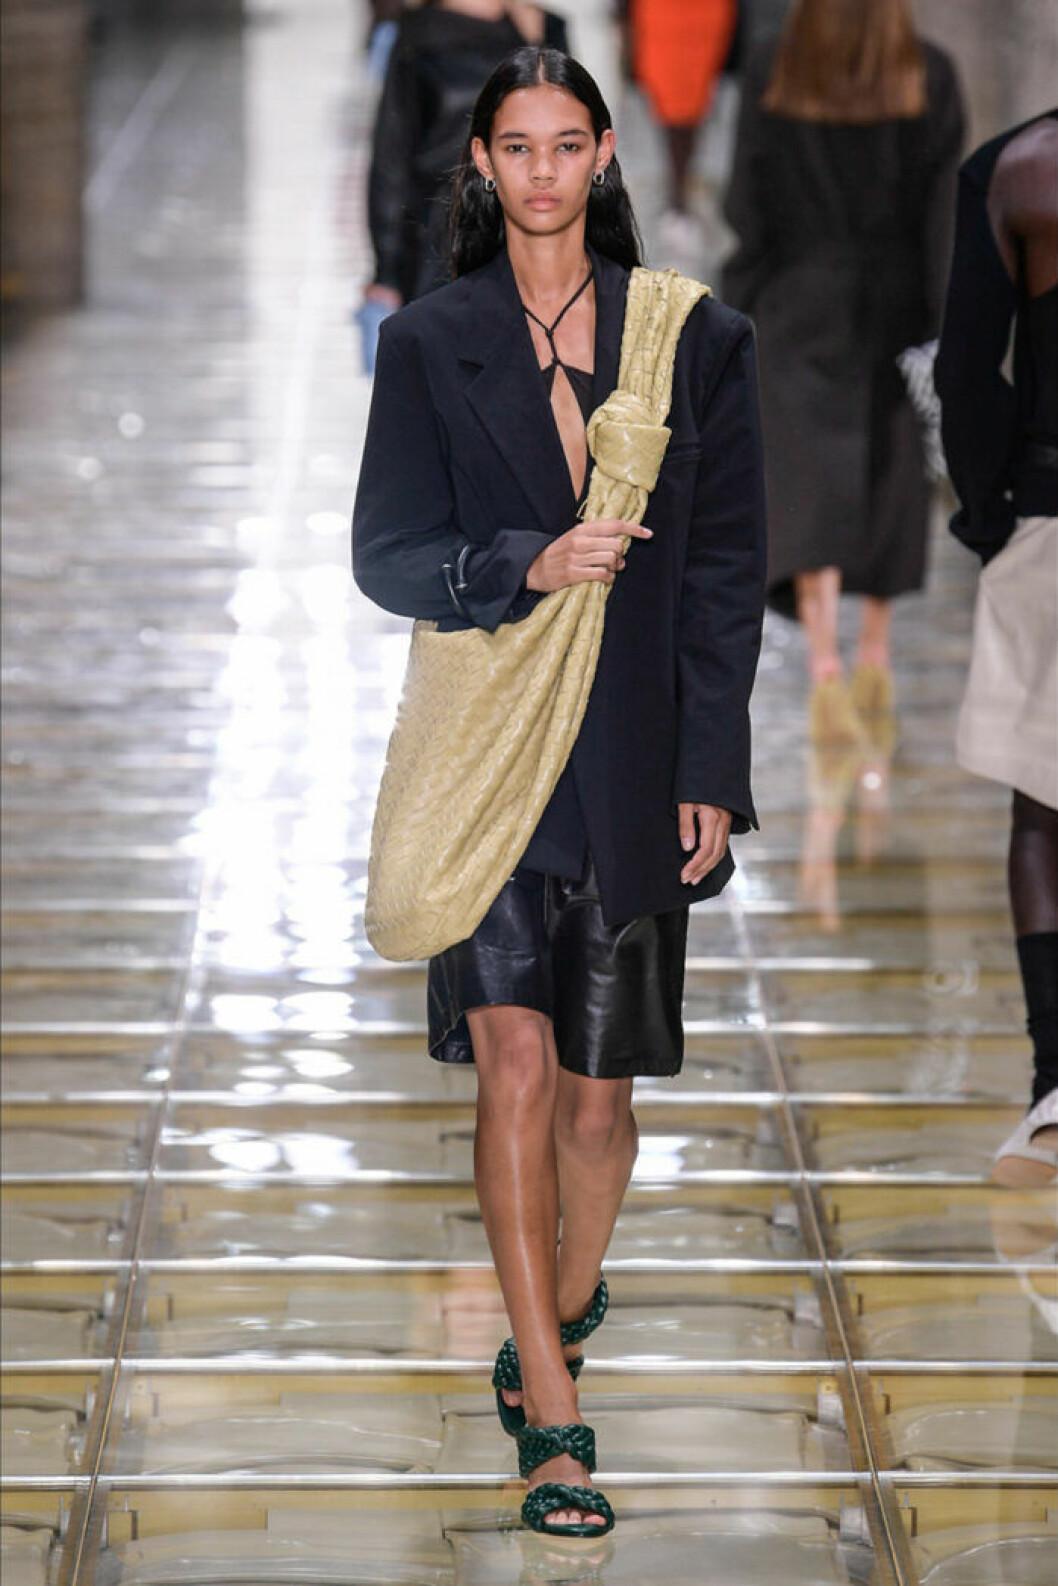 Trender våren 2020 Bottega Veneta svarta cityshorts i läder